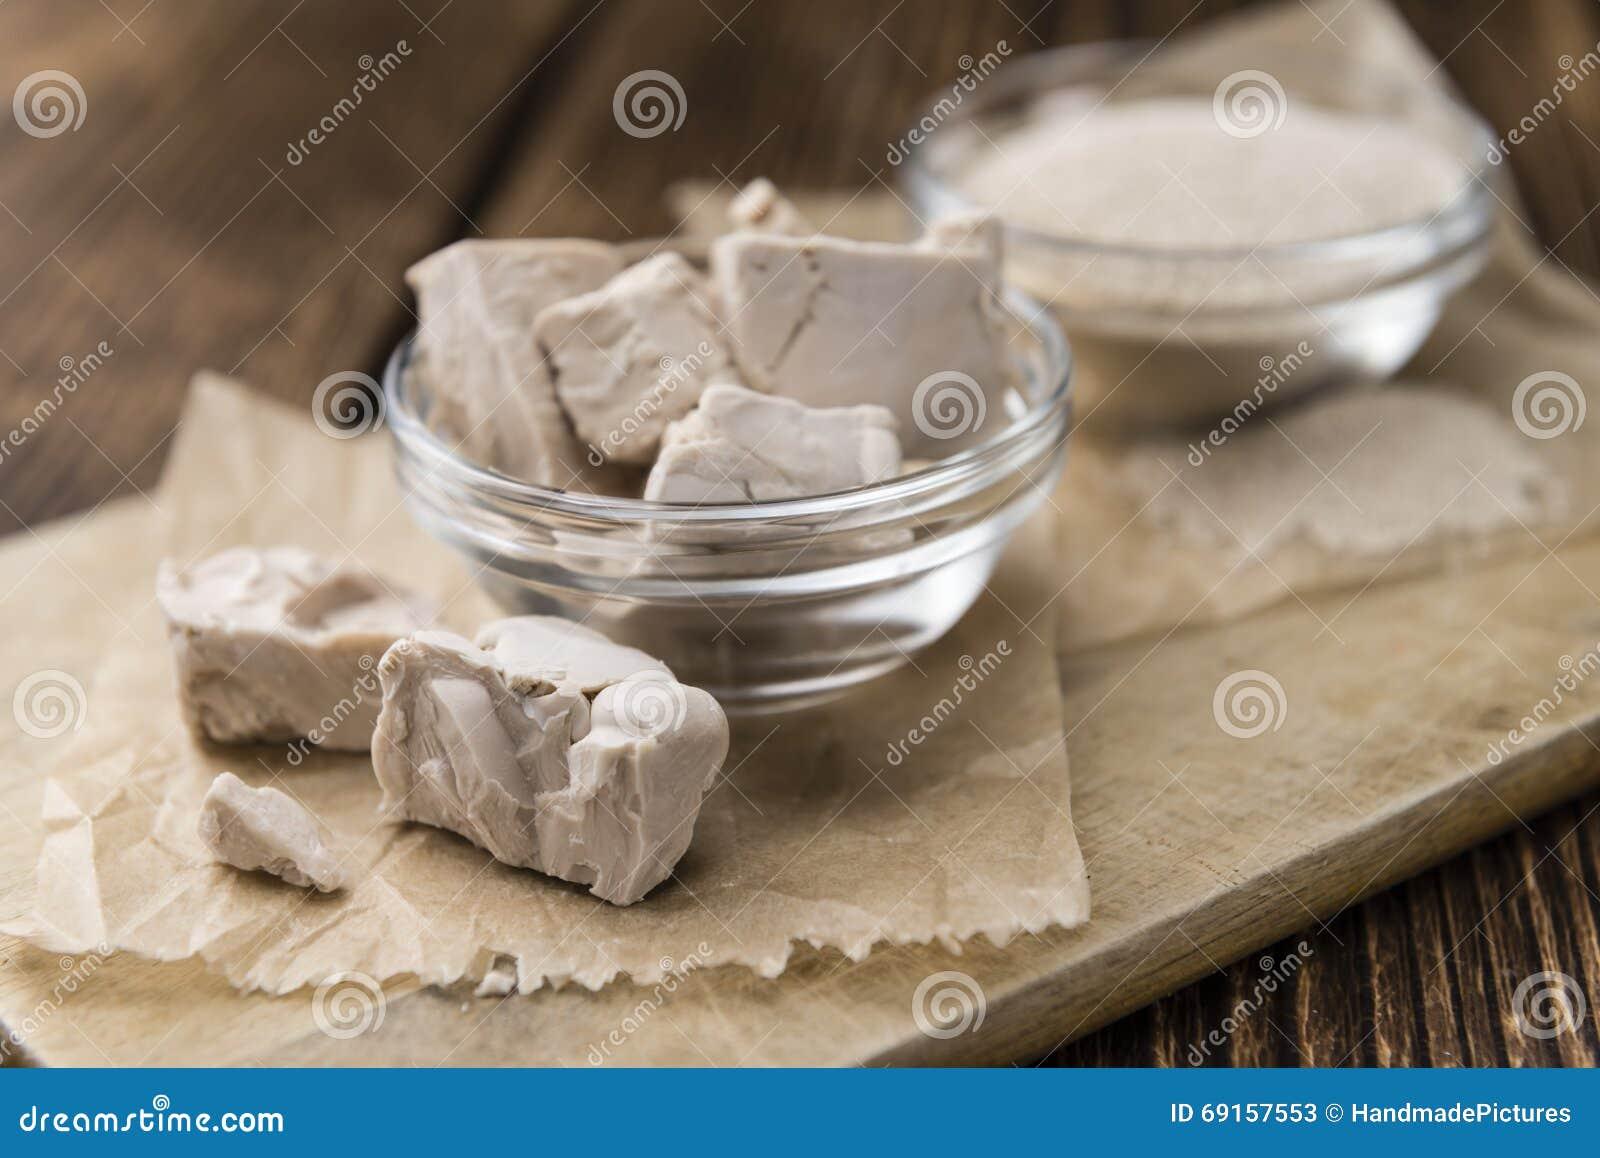 Yeast (fresh and dried)